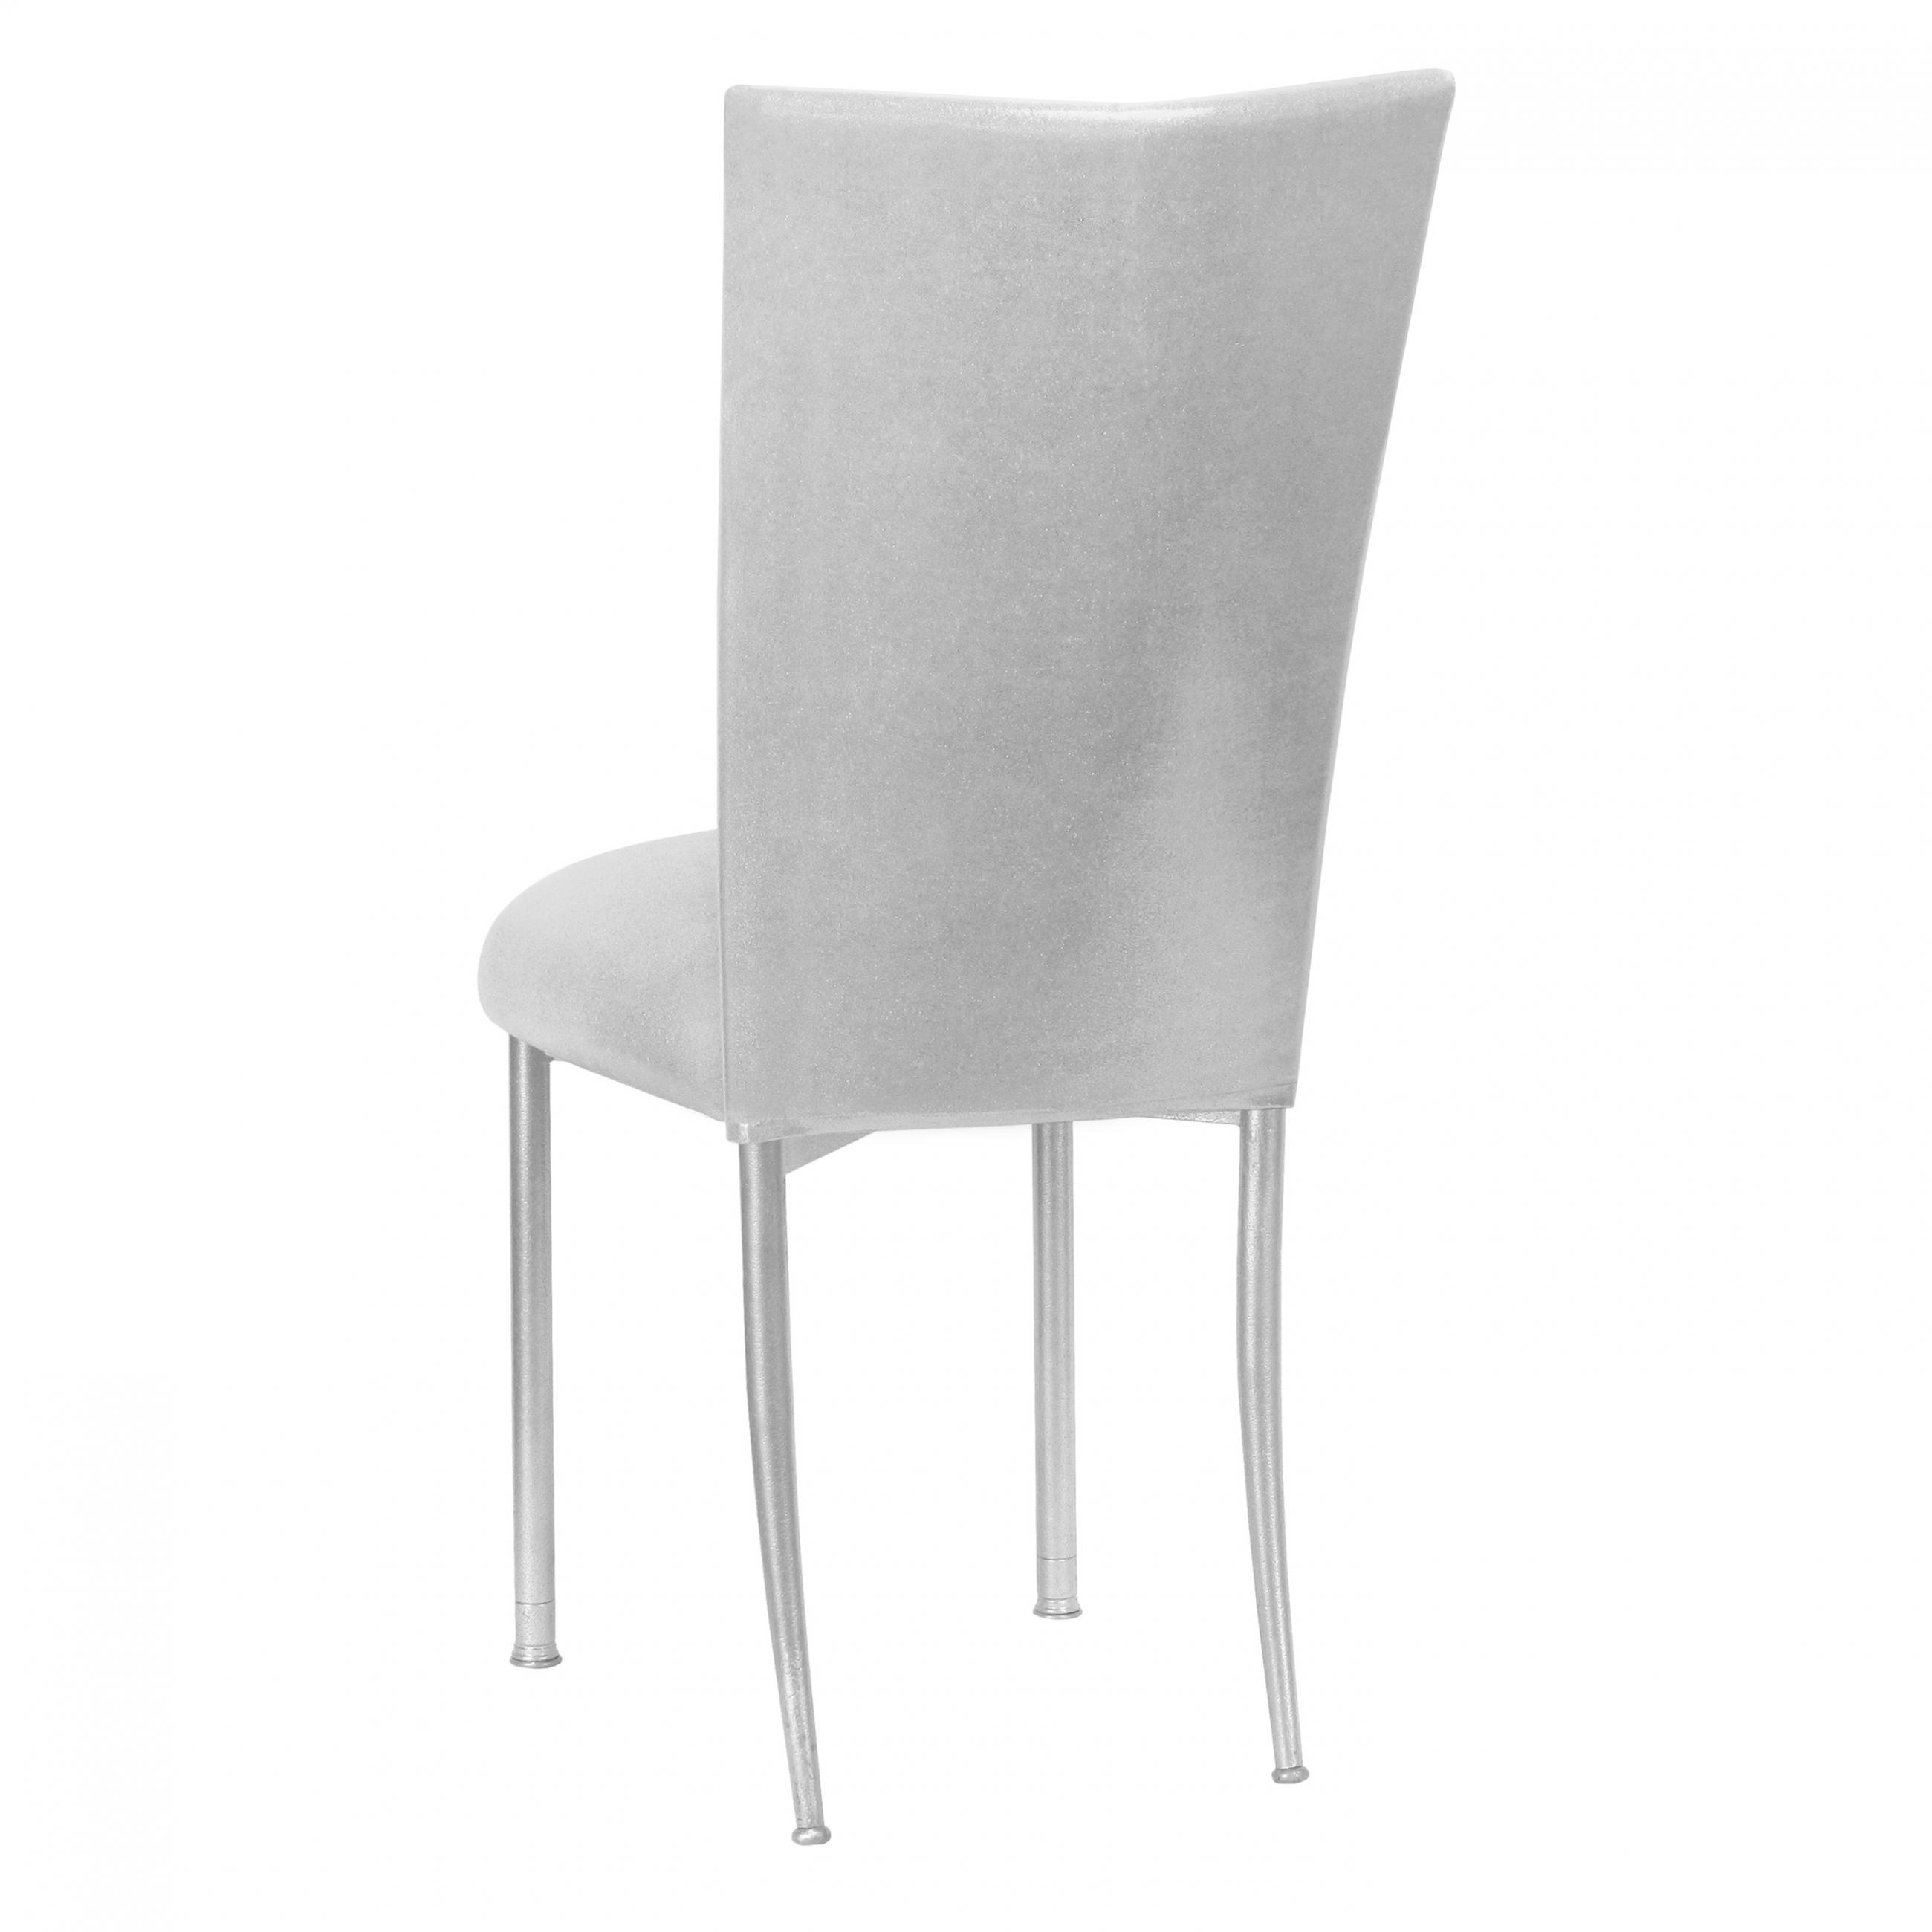 Peachy Stretch Knit Metallic Silver Fanfare Chameleon Chair Topper Beatyapartments Chair Design Images Beatyapartmentscom